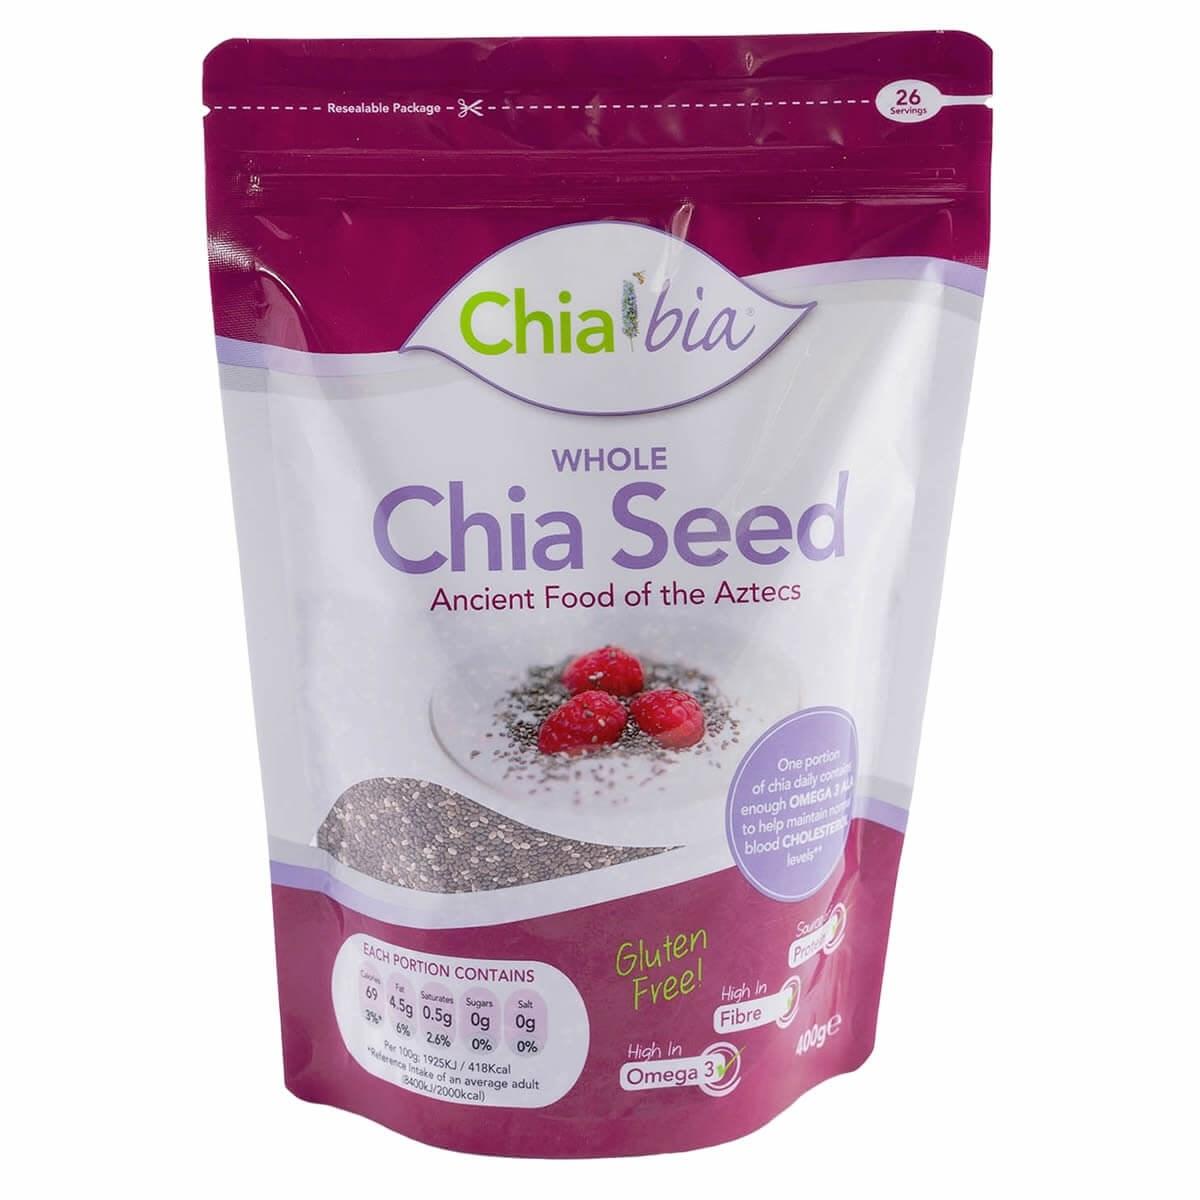 Chia Bia Whole Chia Seed 400g